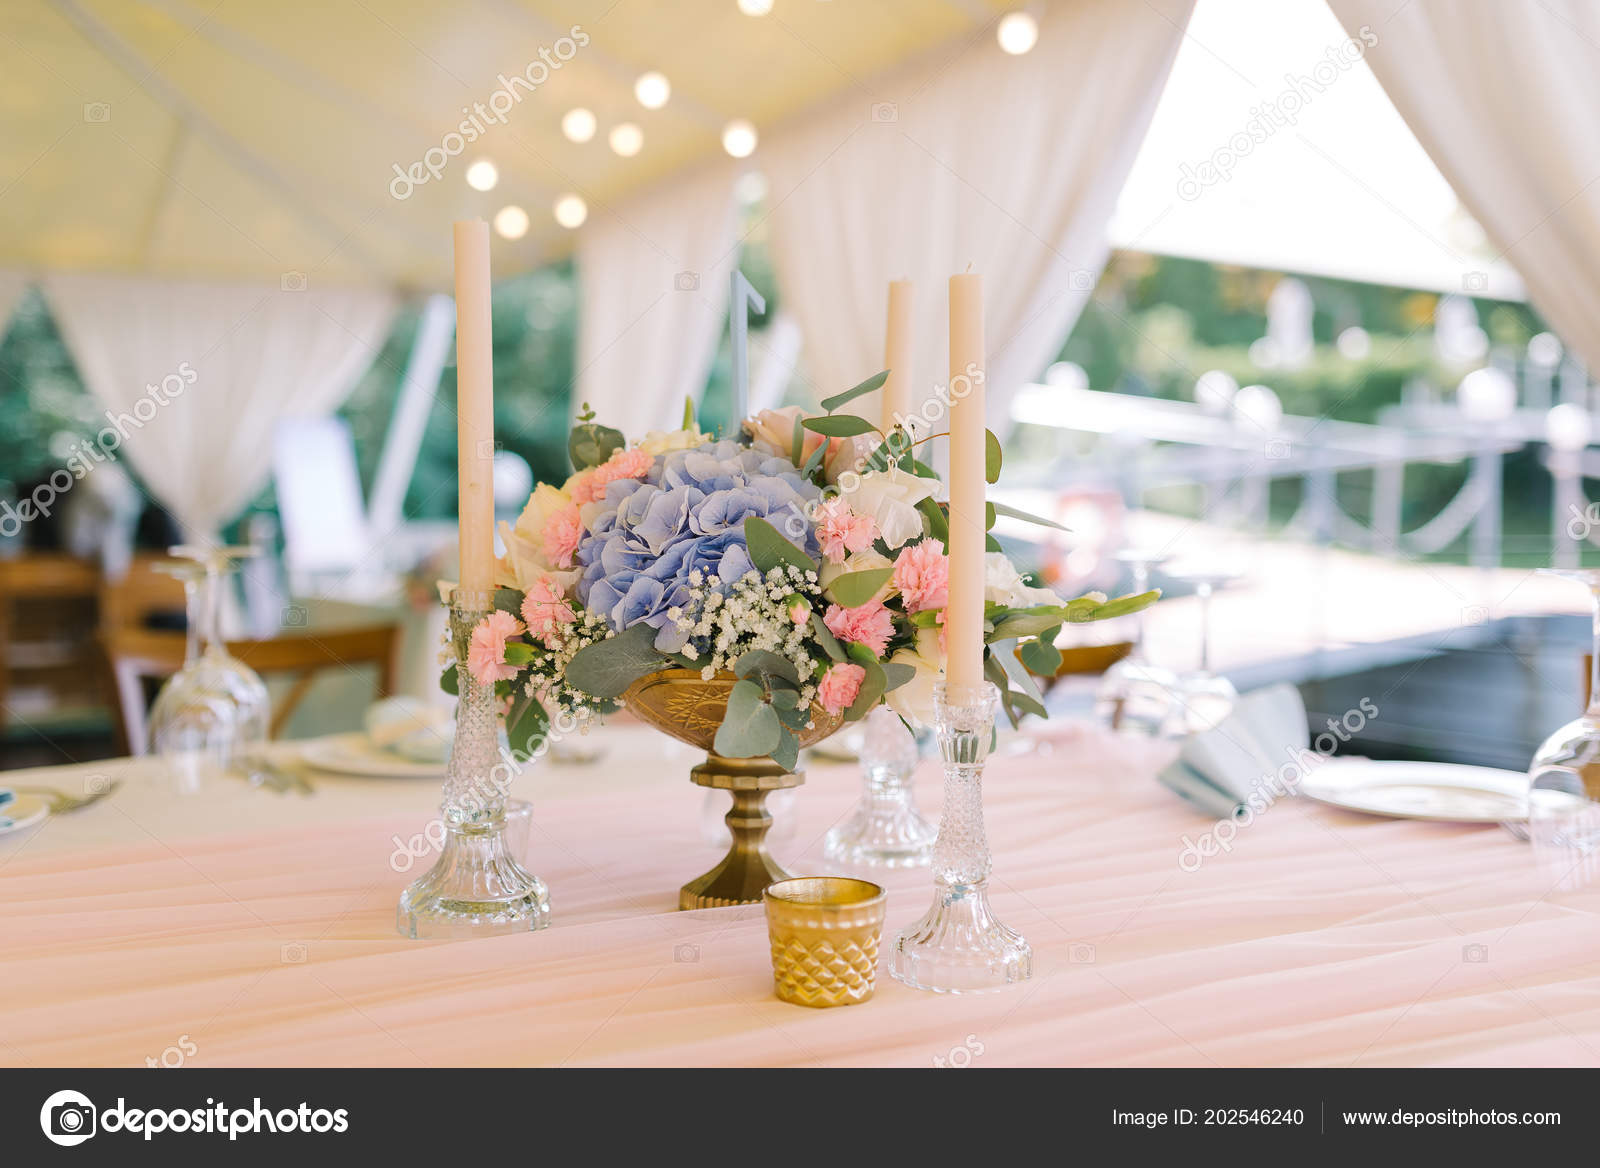 Beautiful Wedding Decor On Round Tables In Gentle Flowers Stock Photo Image By C Olgaburtseva 202546240